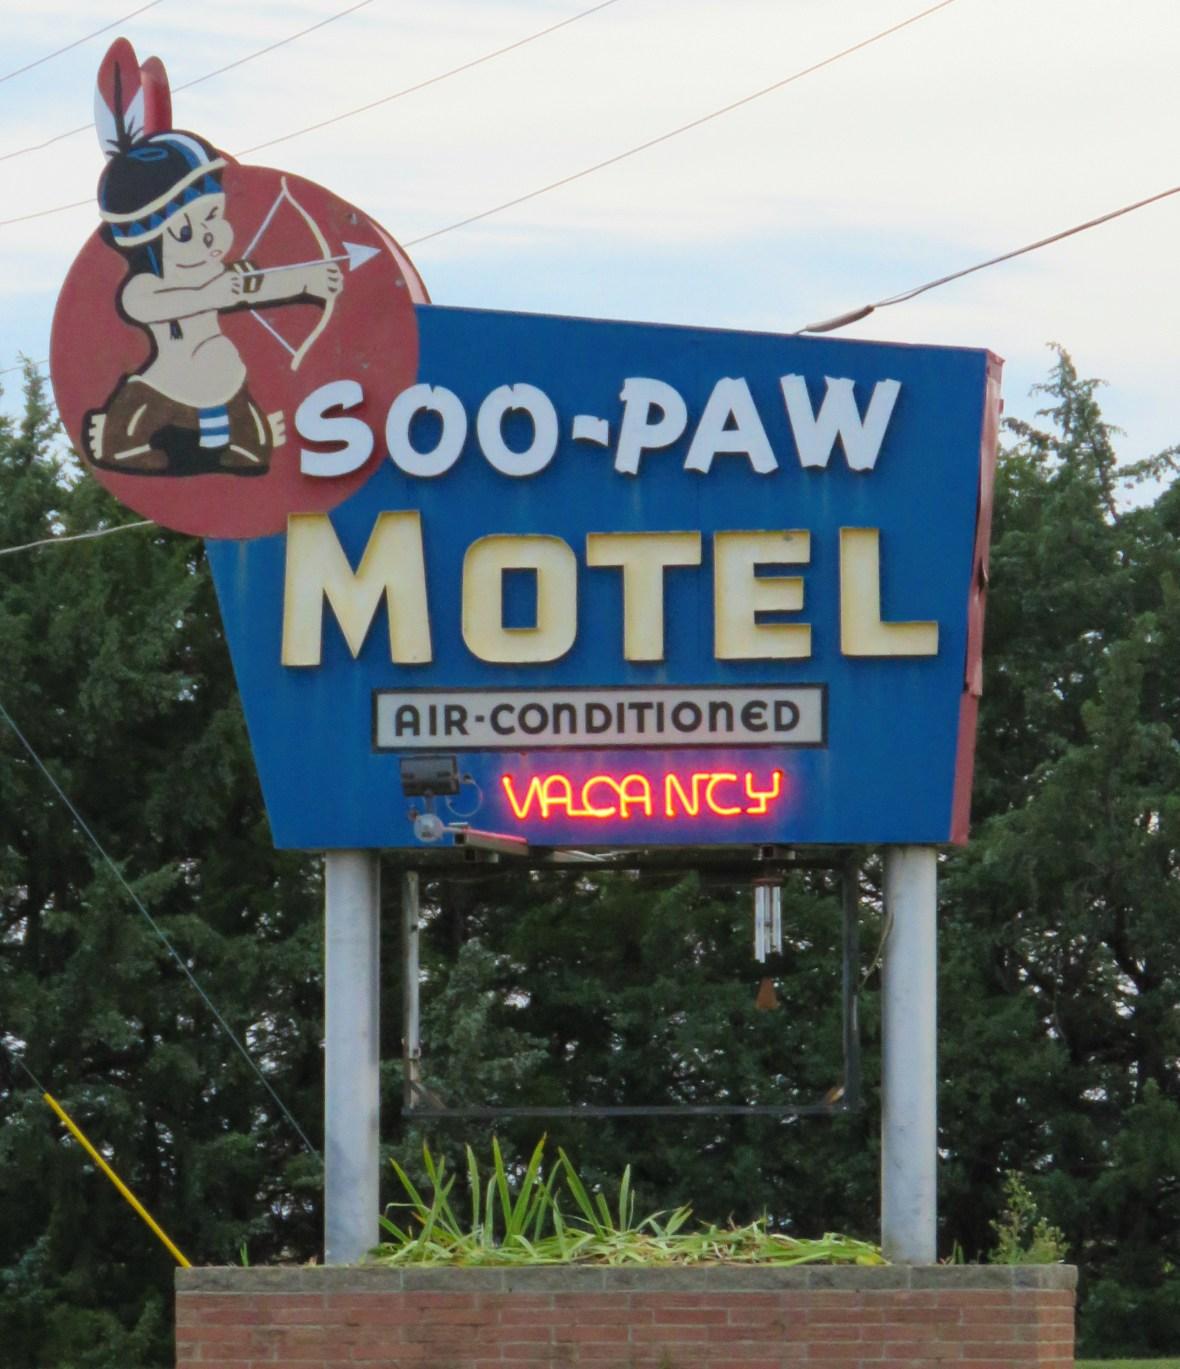 Soo-Paw Motel - U.S. 34, Trenton, Nebraska U.S.A. - August 25, 2016